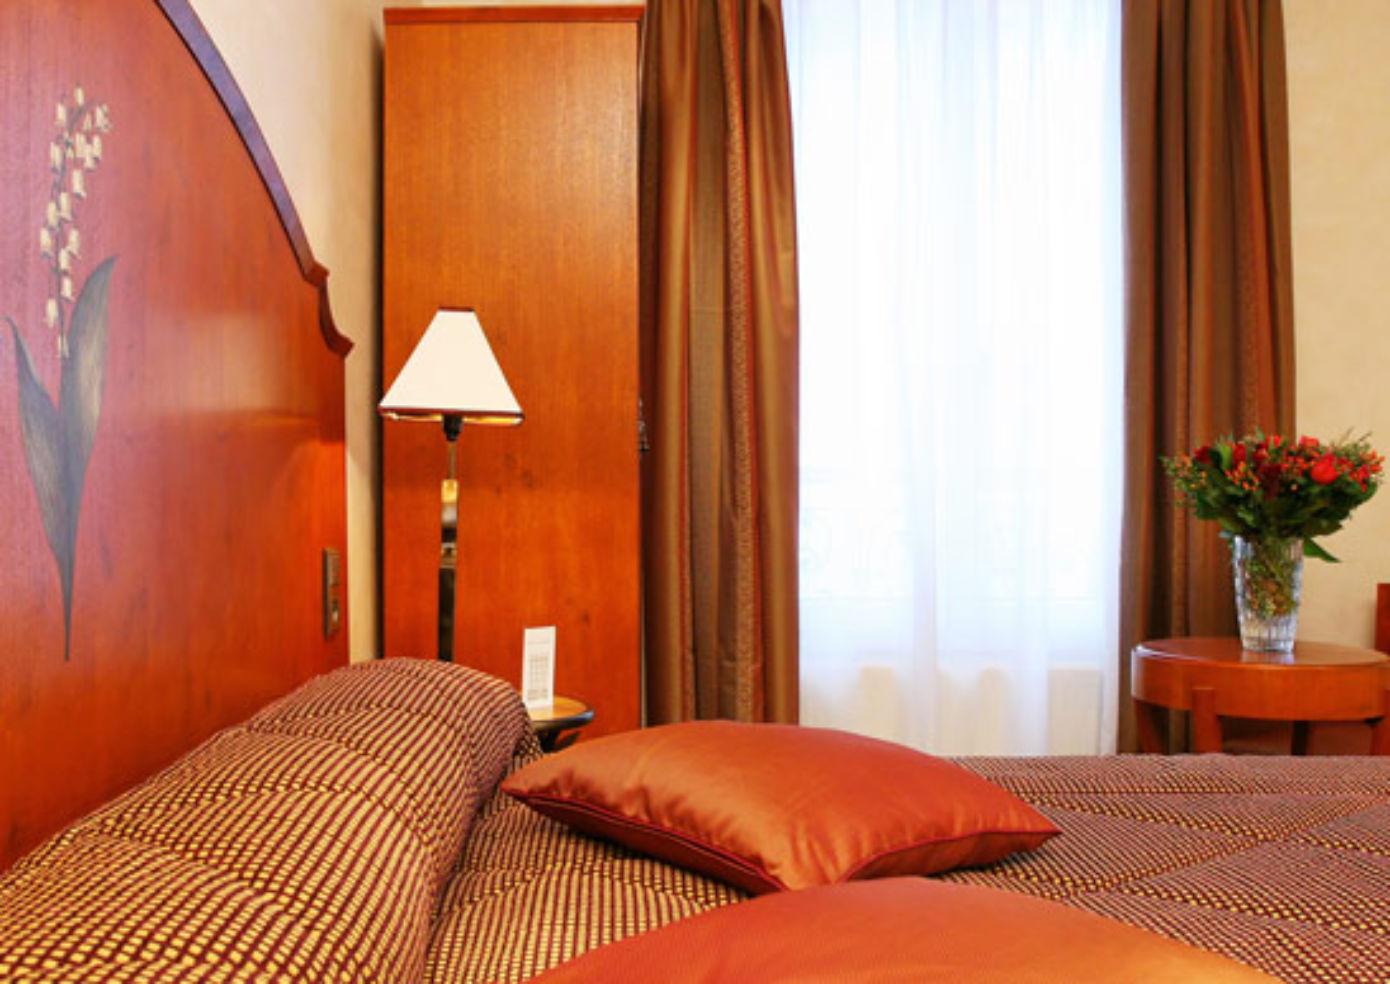 A room at Hotel Muguet in Paris